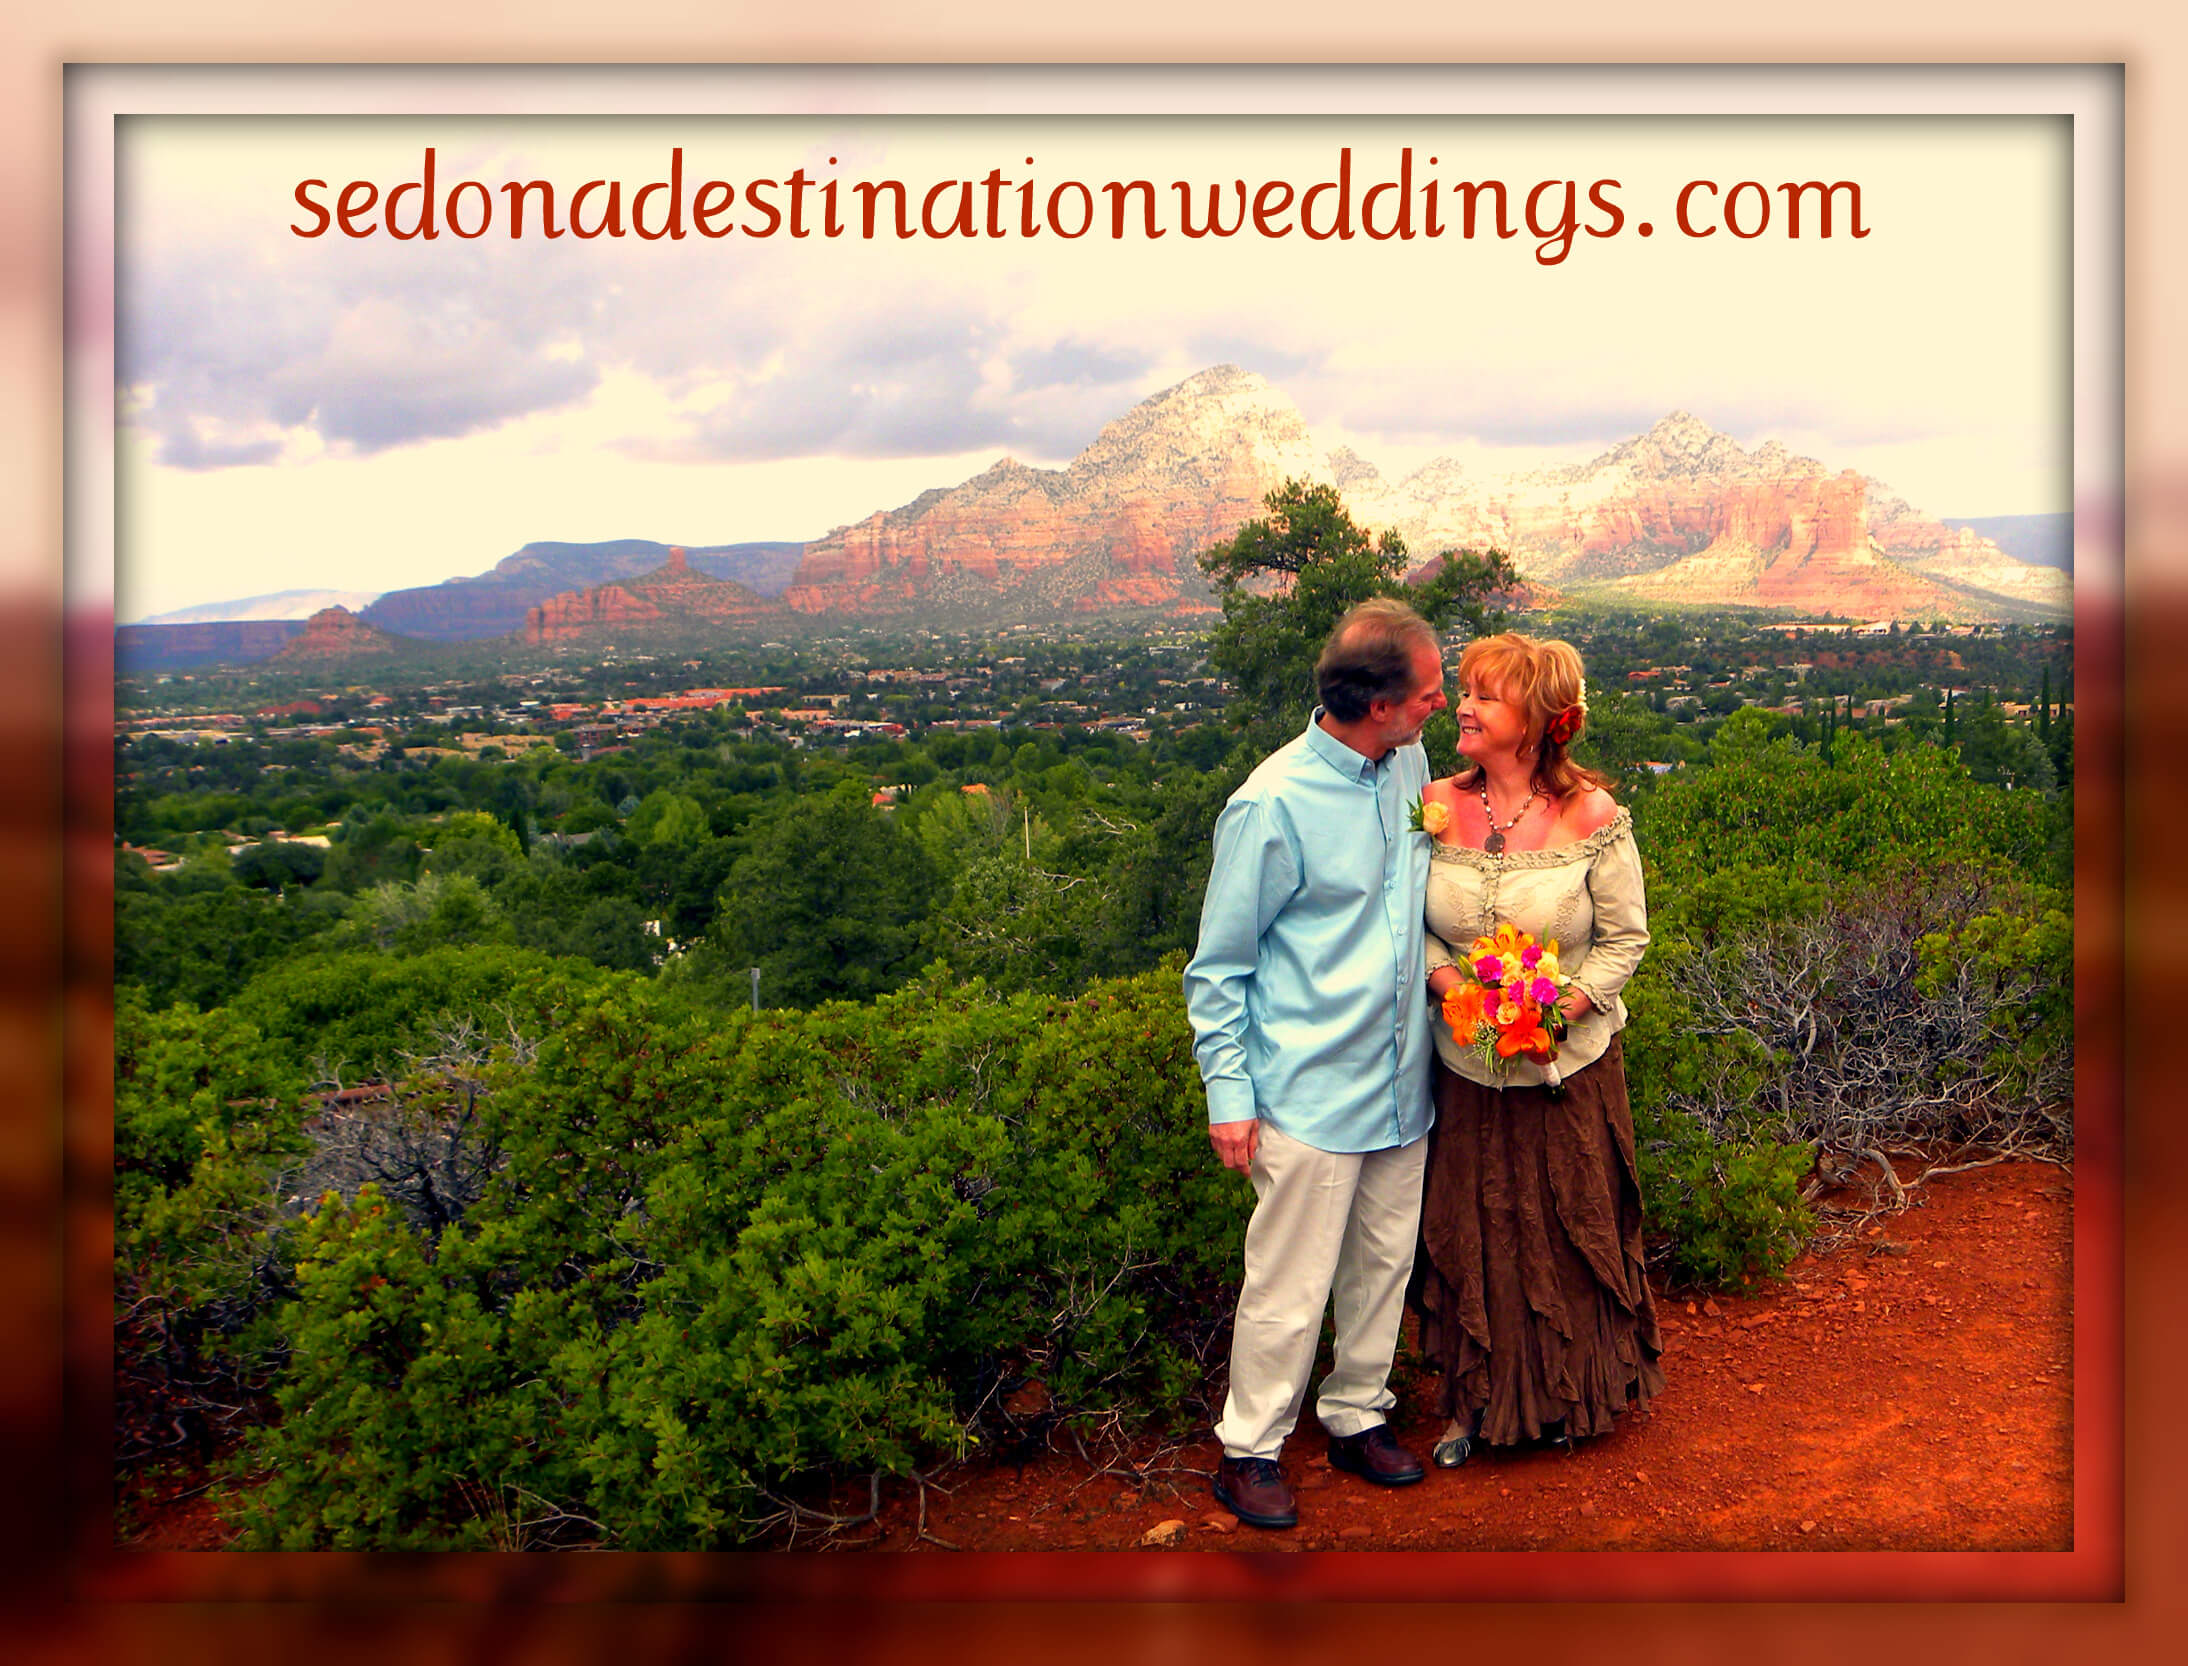 Top 5 Sedona Wedding Sites – Airport Vortex